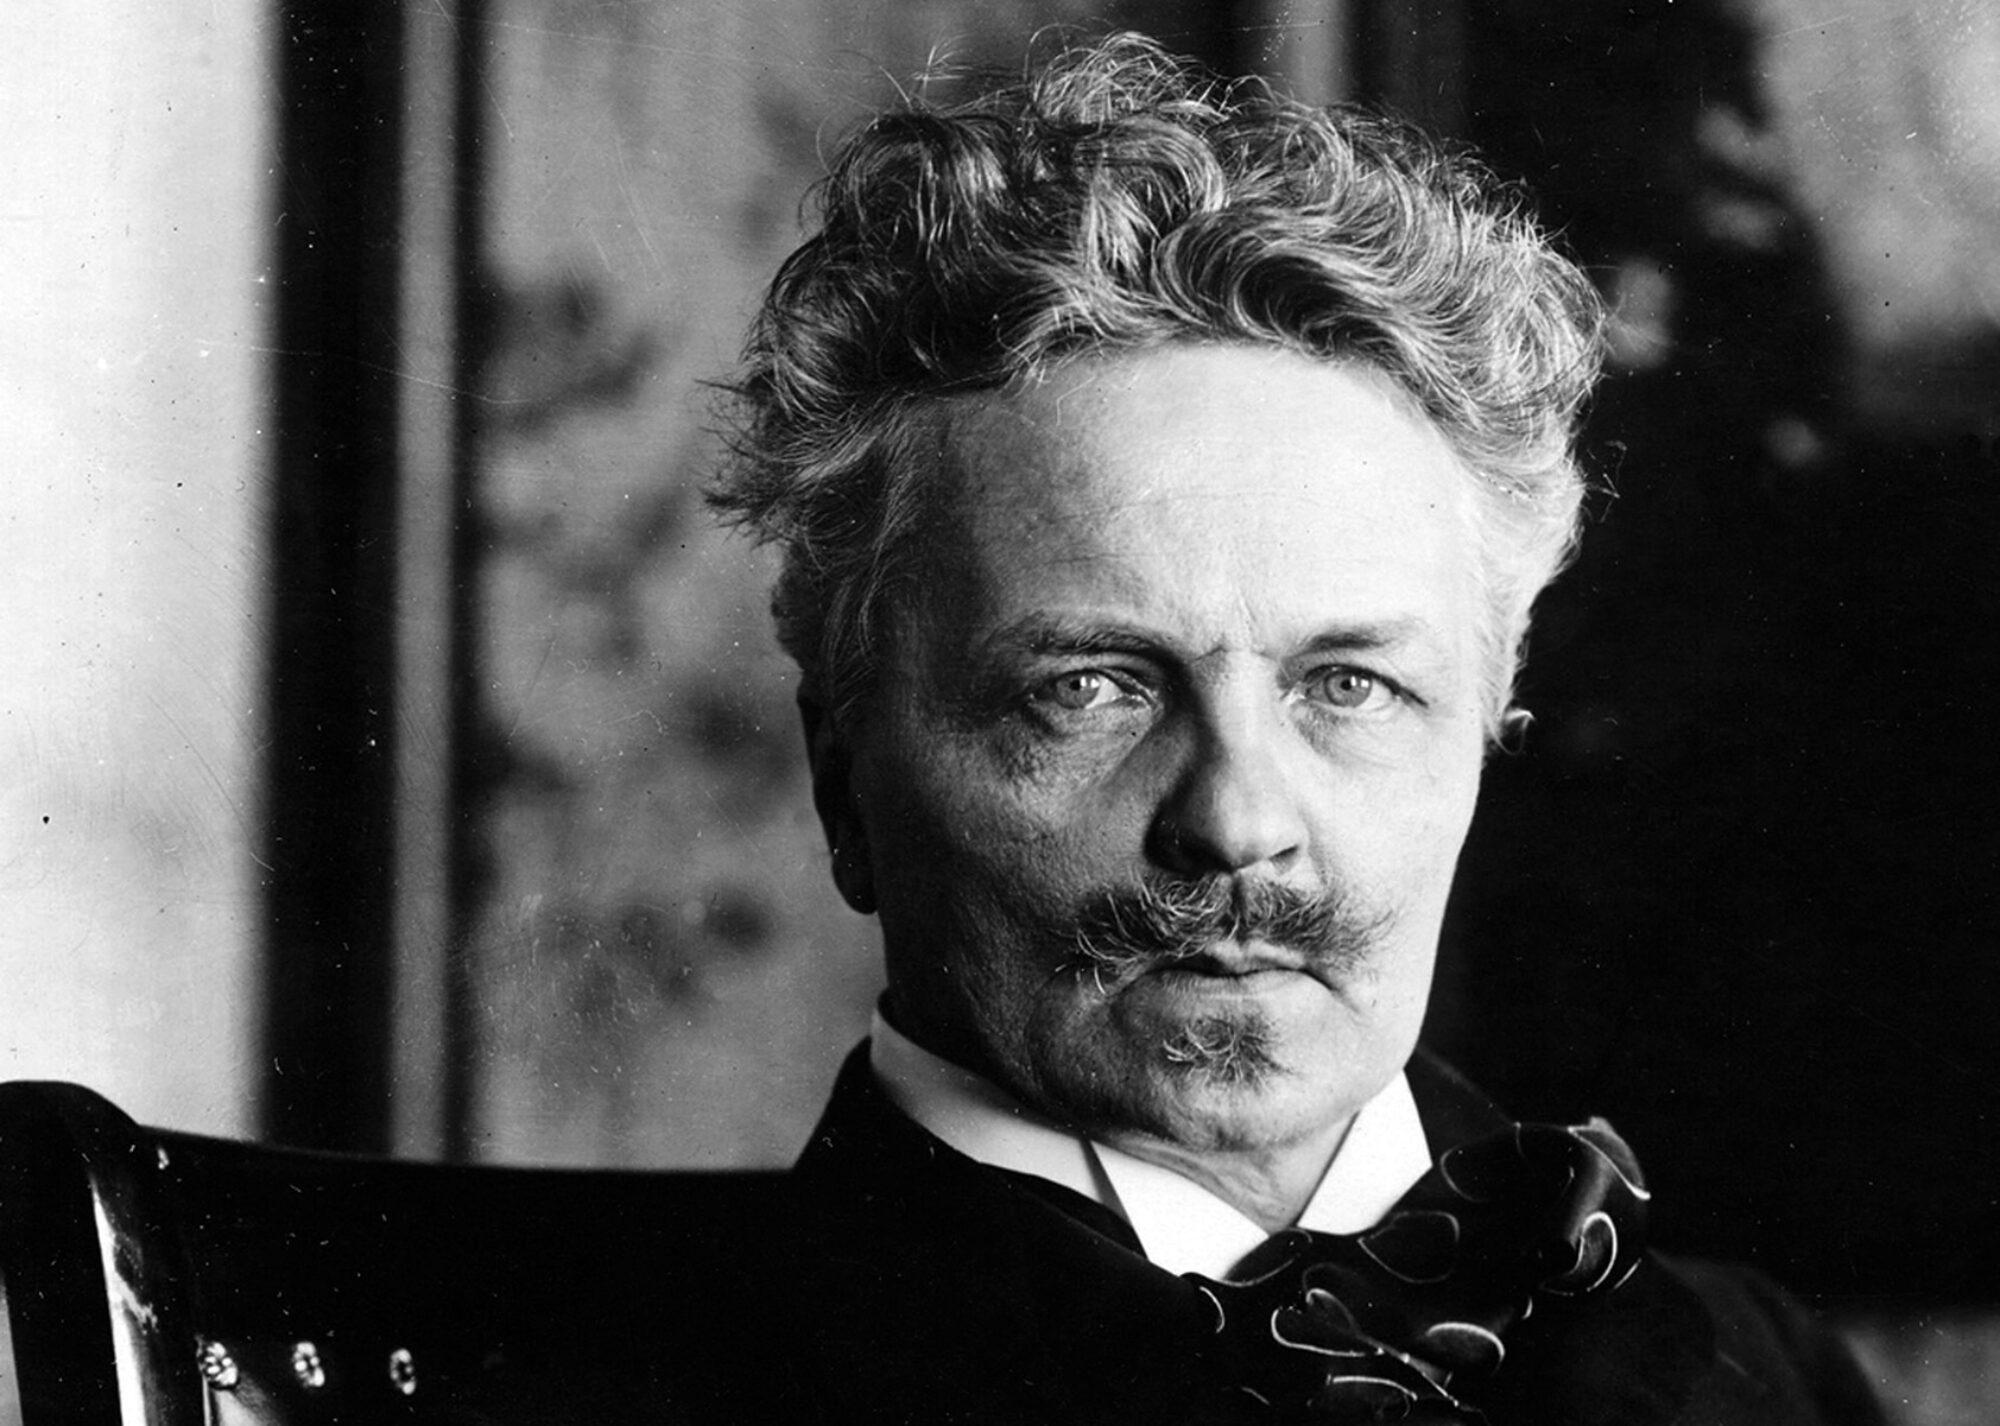 Strindbergssällskapet